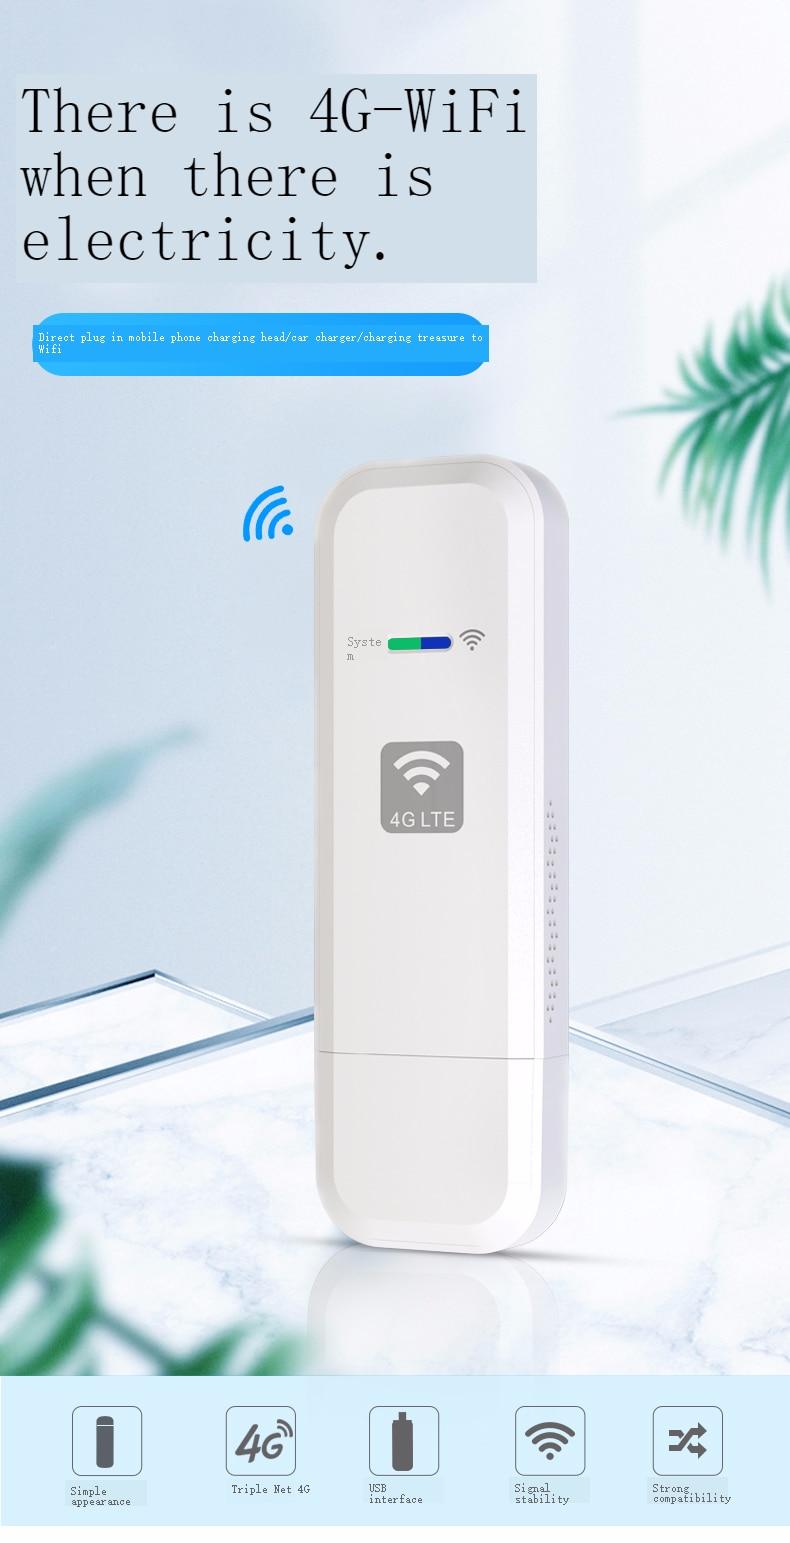 Новая портативная Мобильная Wi-Fi карта 4G, автомобильная портативная беспроводная сетевая карта, беспроводной маршрутизатор, карта маршрути...